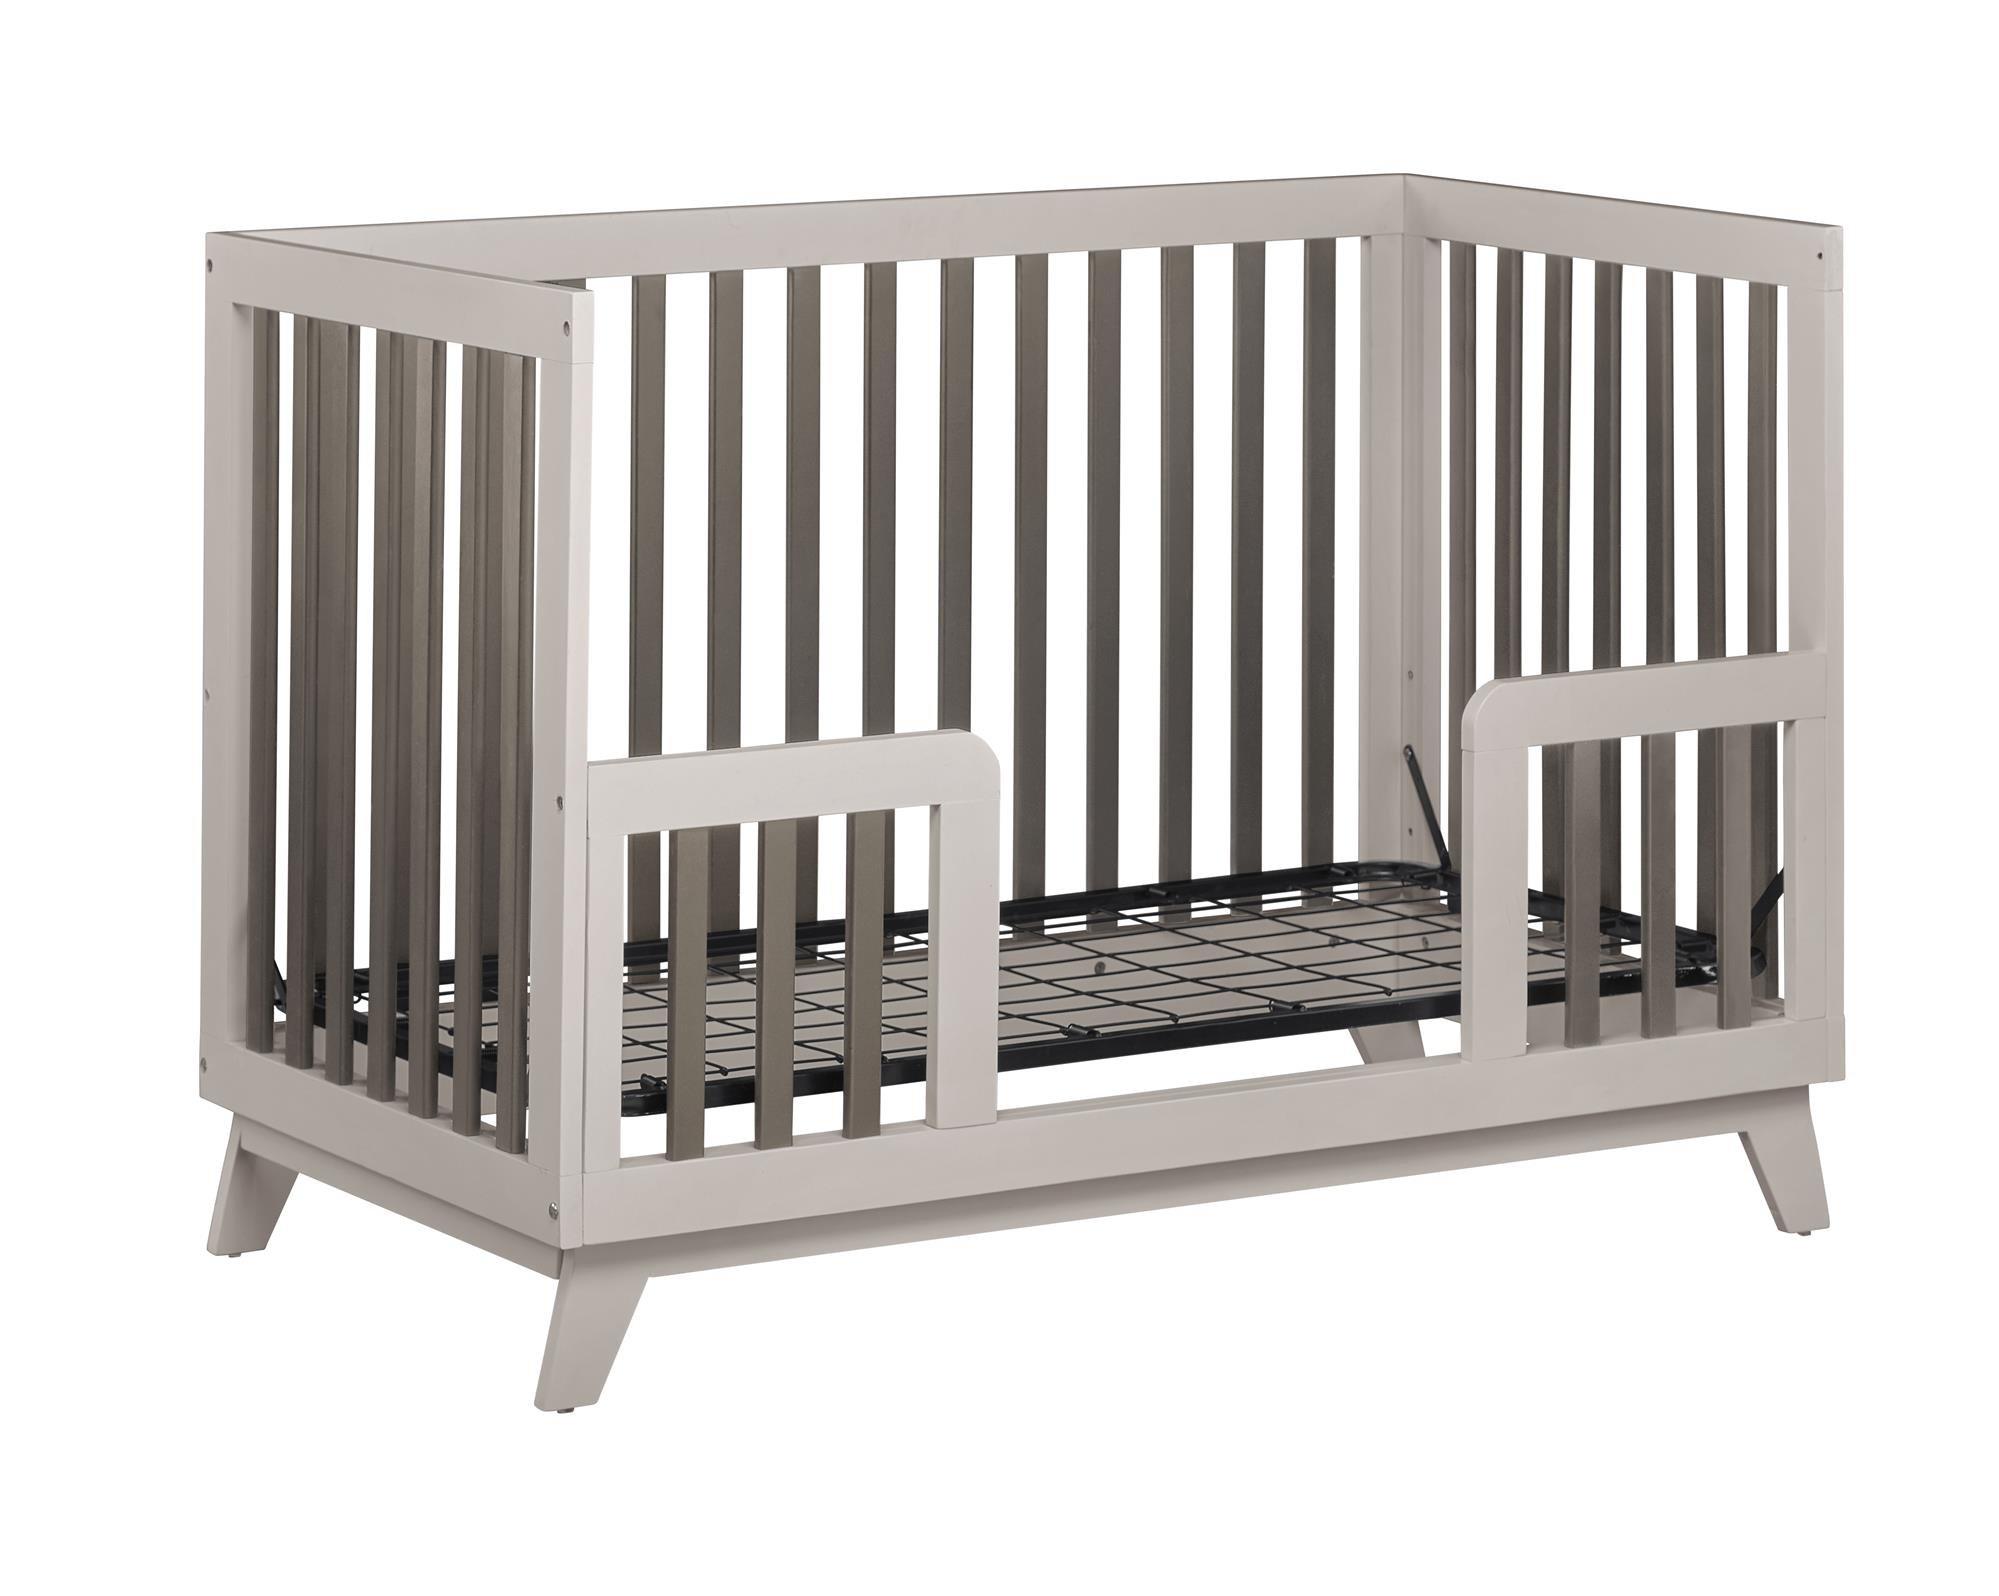 Little Seeds Rowan Valley Flint Toddler Bed Rail, Two-Tone Gray